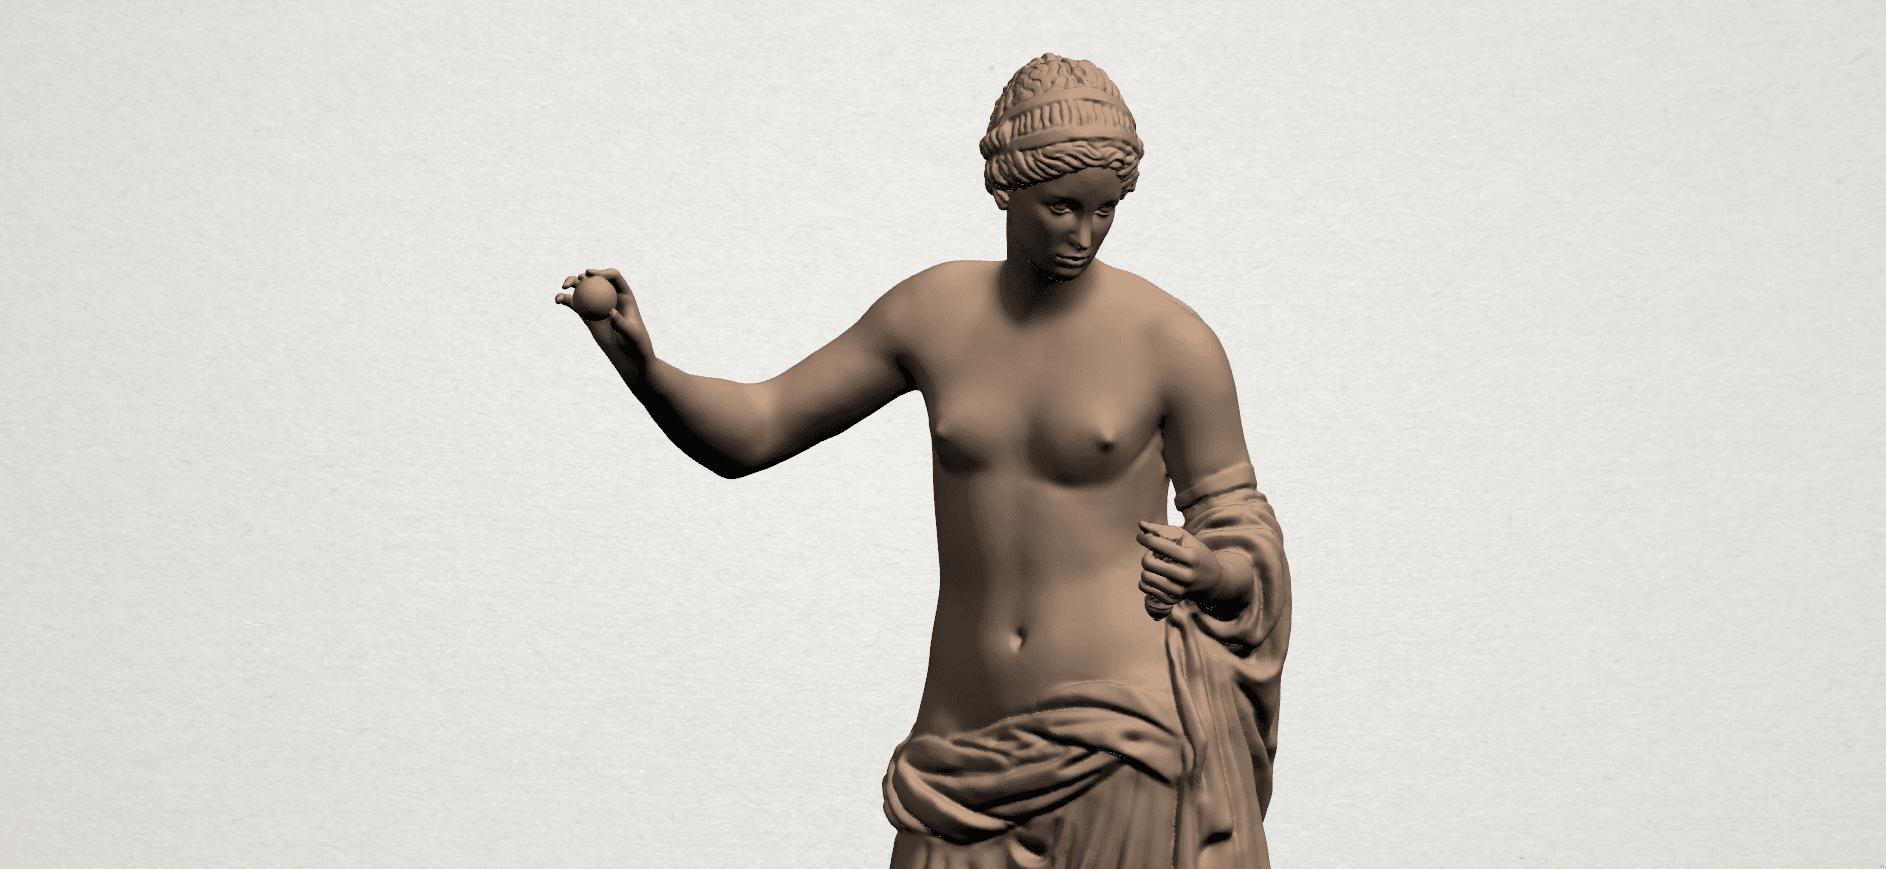 Naked Girl (xiv) A10.png Download free STL file Naked Girl 14 • 3D printer design, GeorgesNikkei